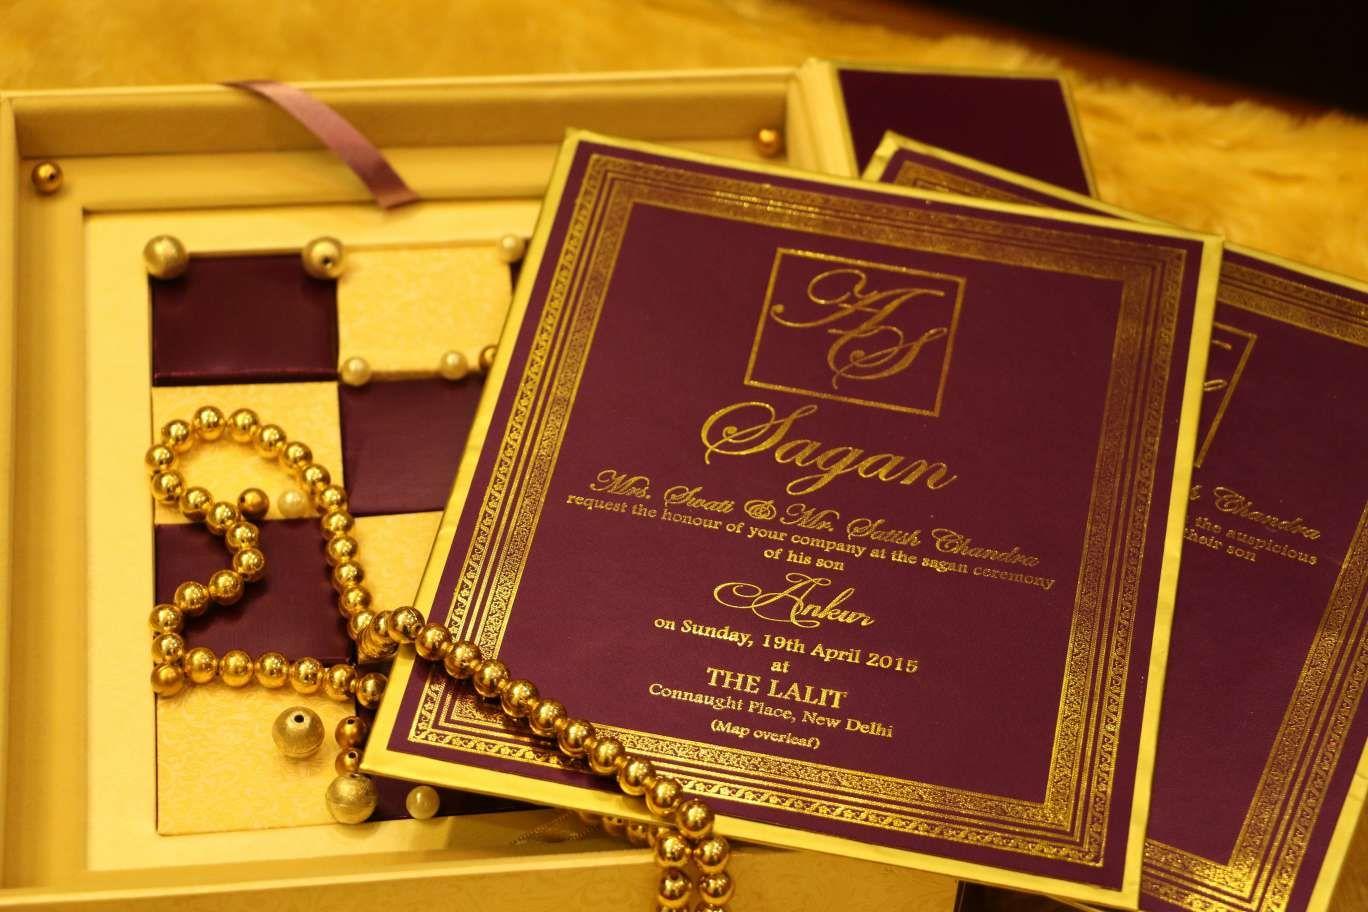 luxury-wedding-invitation-hotel-lalit #newdelhi #weddinginvitation ...